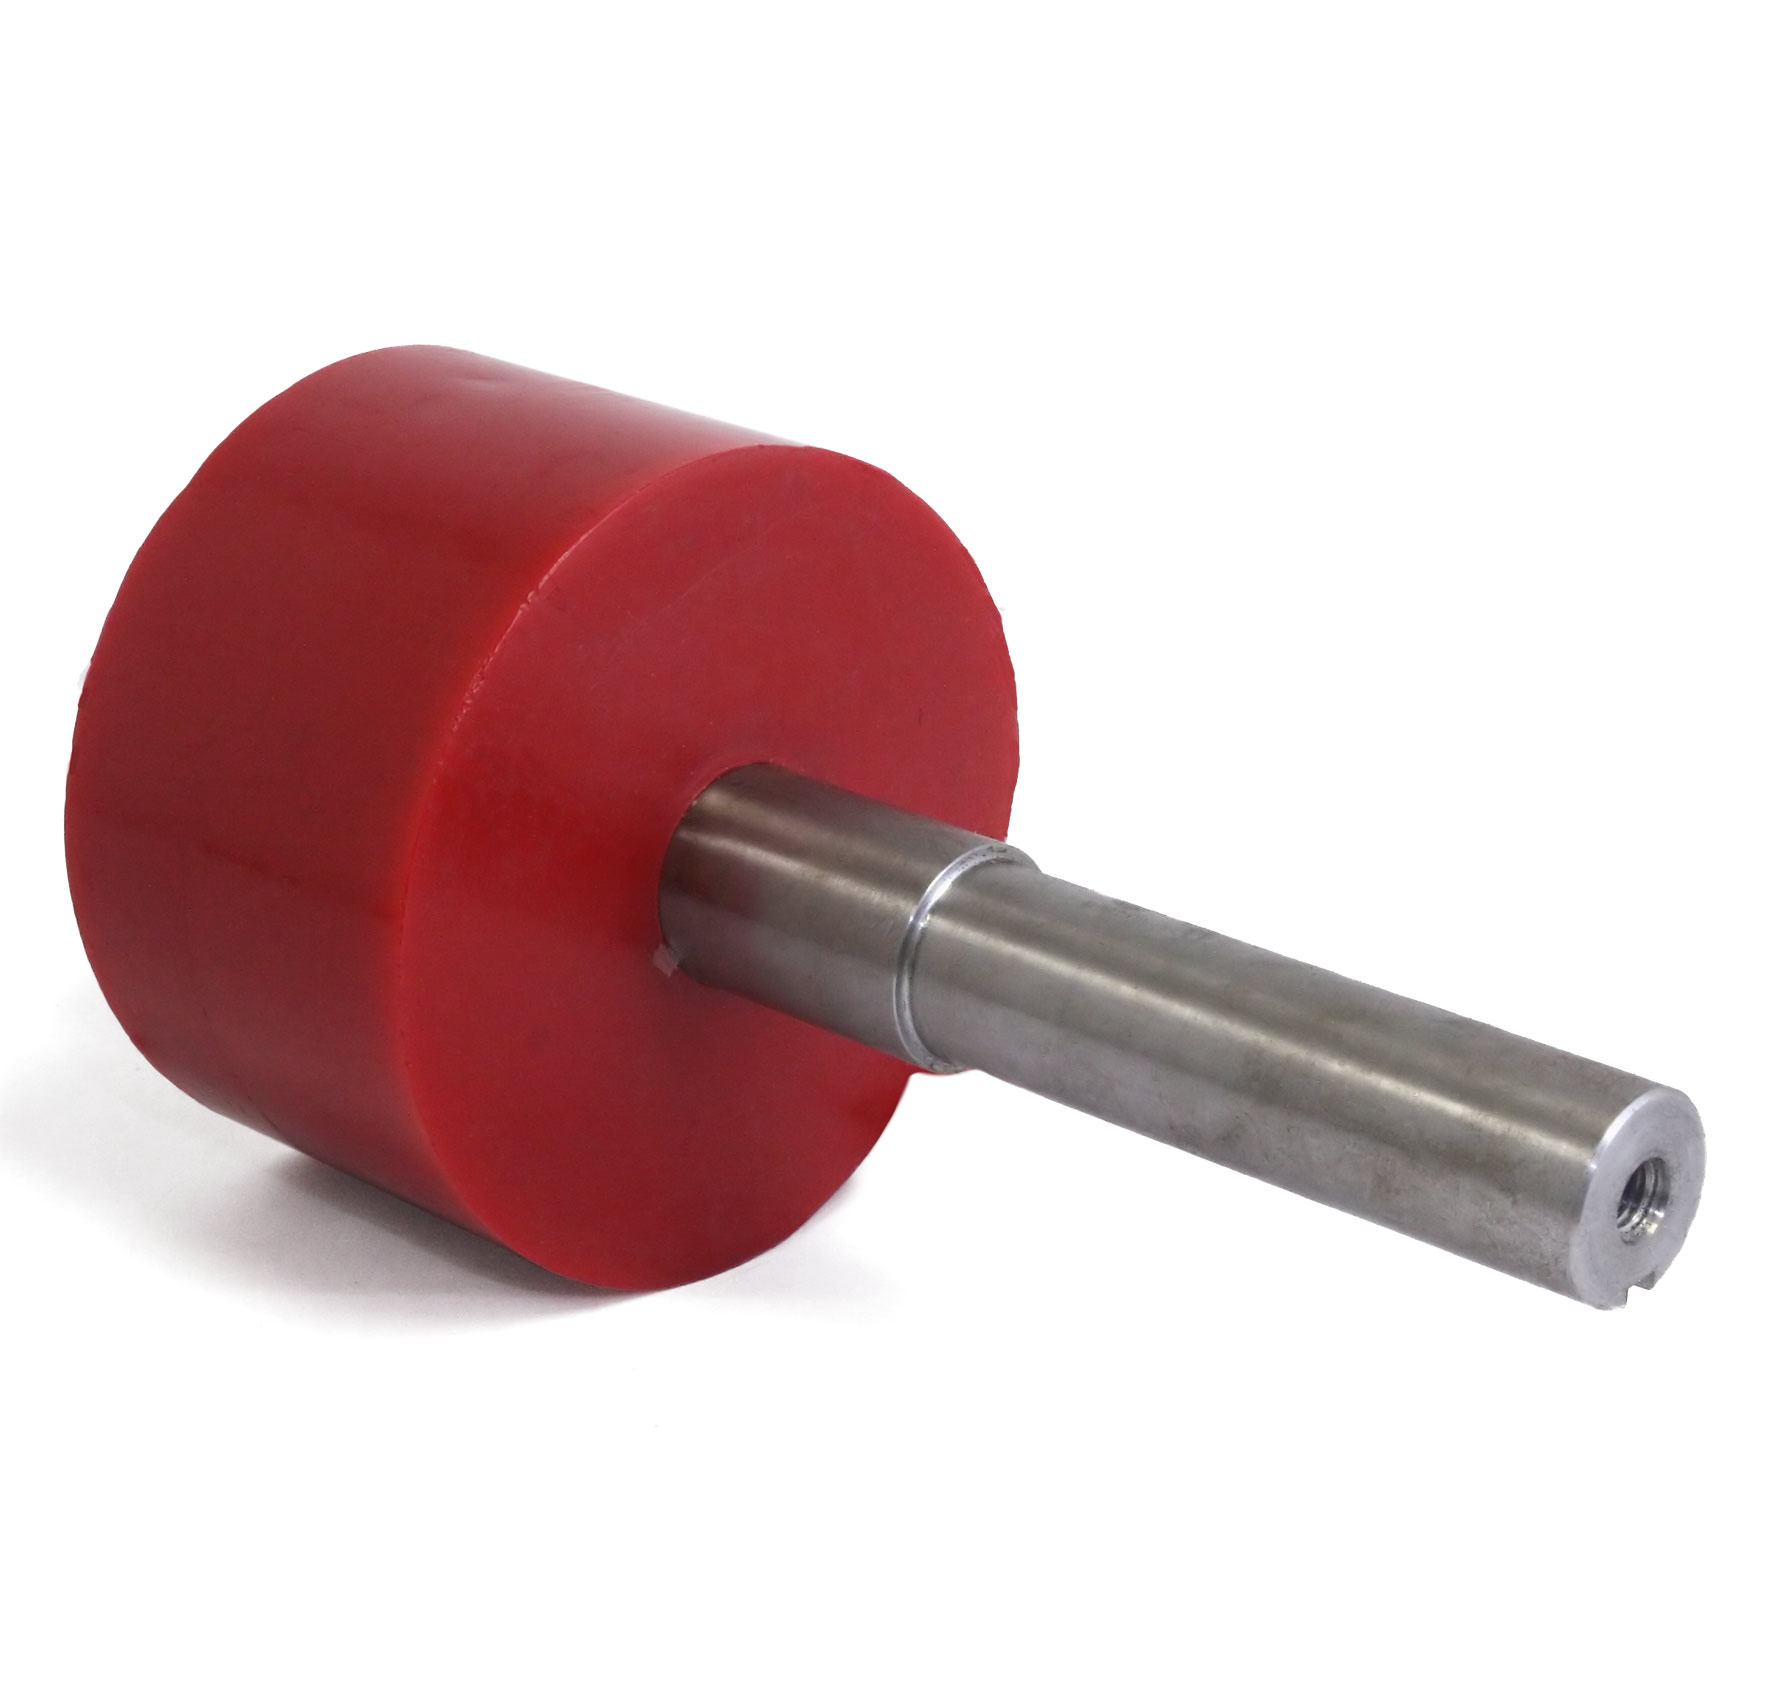 Drive Rollers Conveyor Rollers Equipment Roller